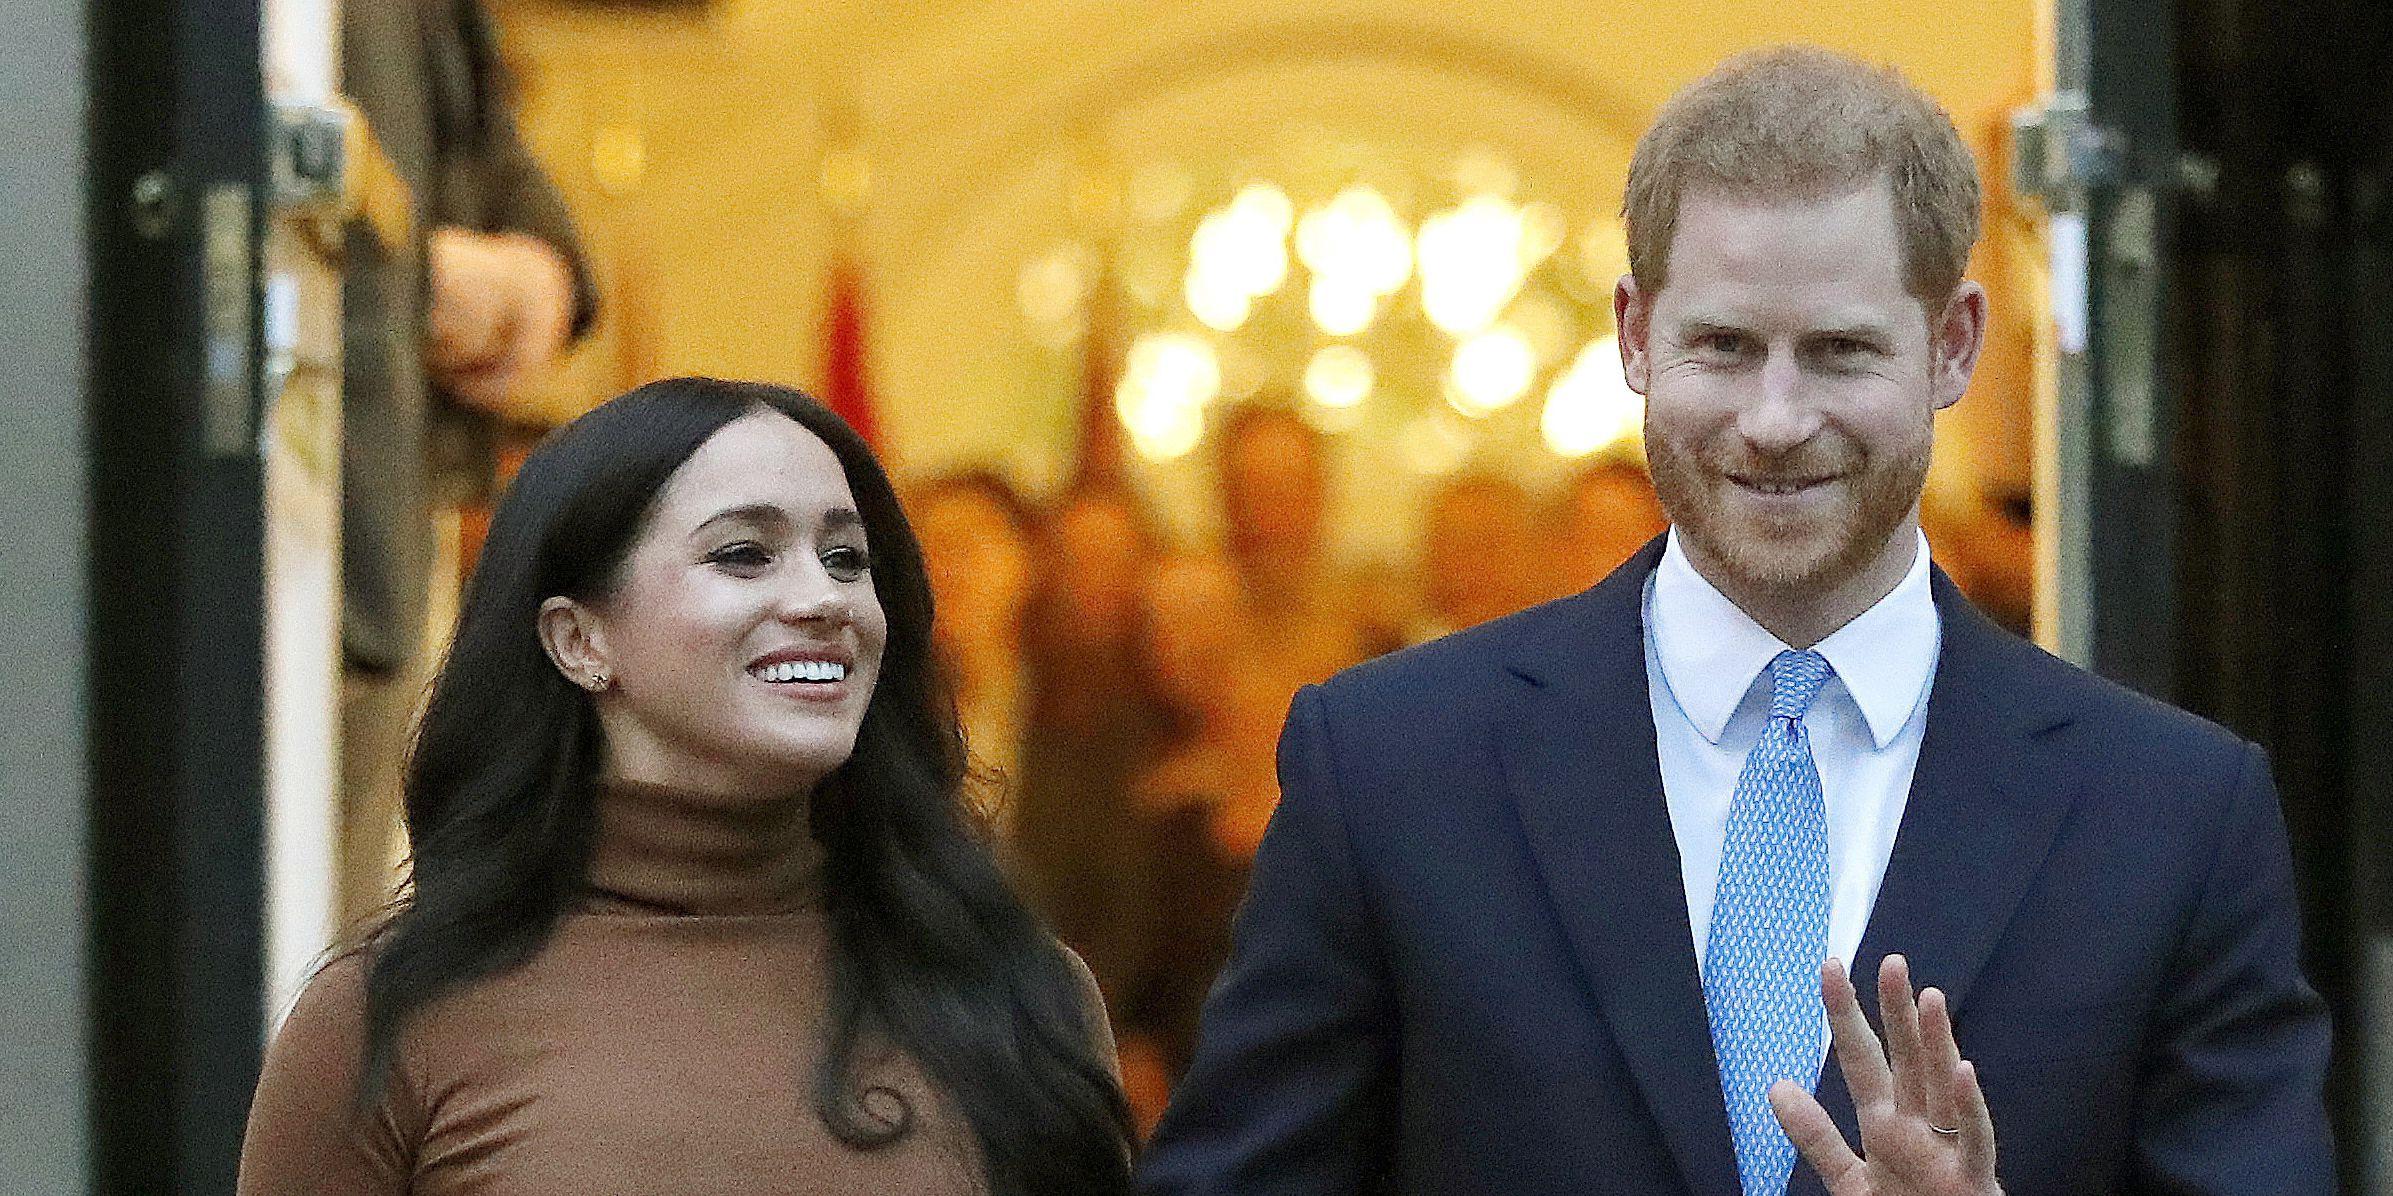 Prince Harry: Split from royal life 'unbelievably tough'